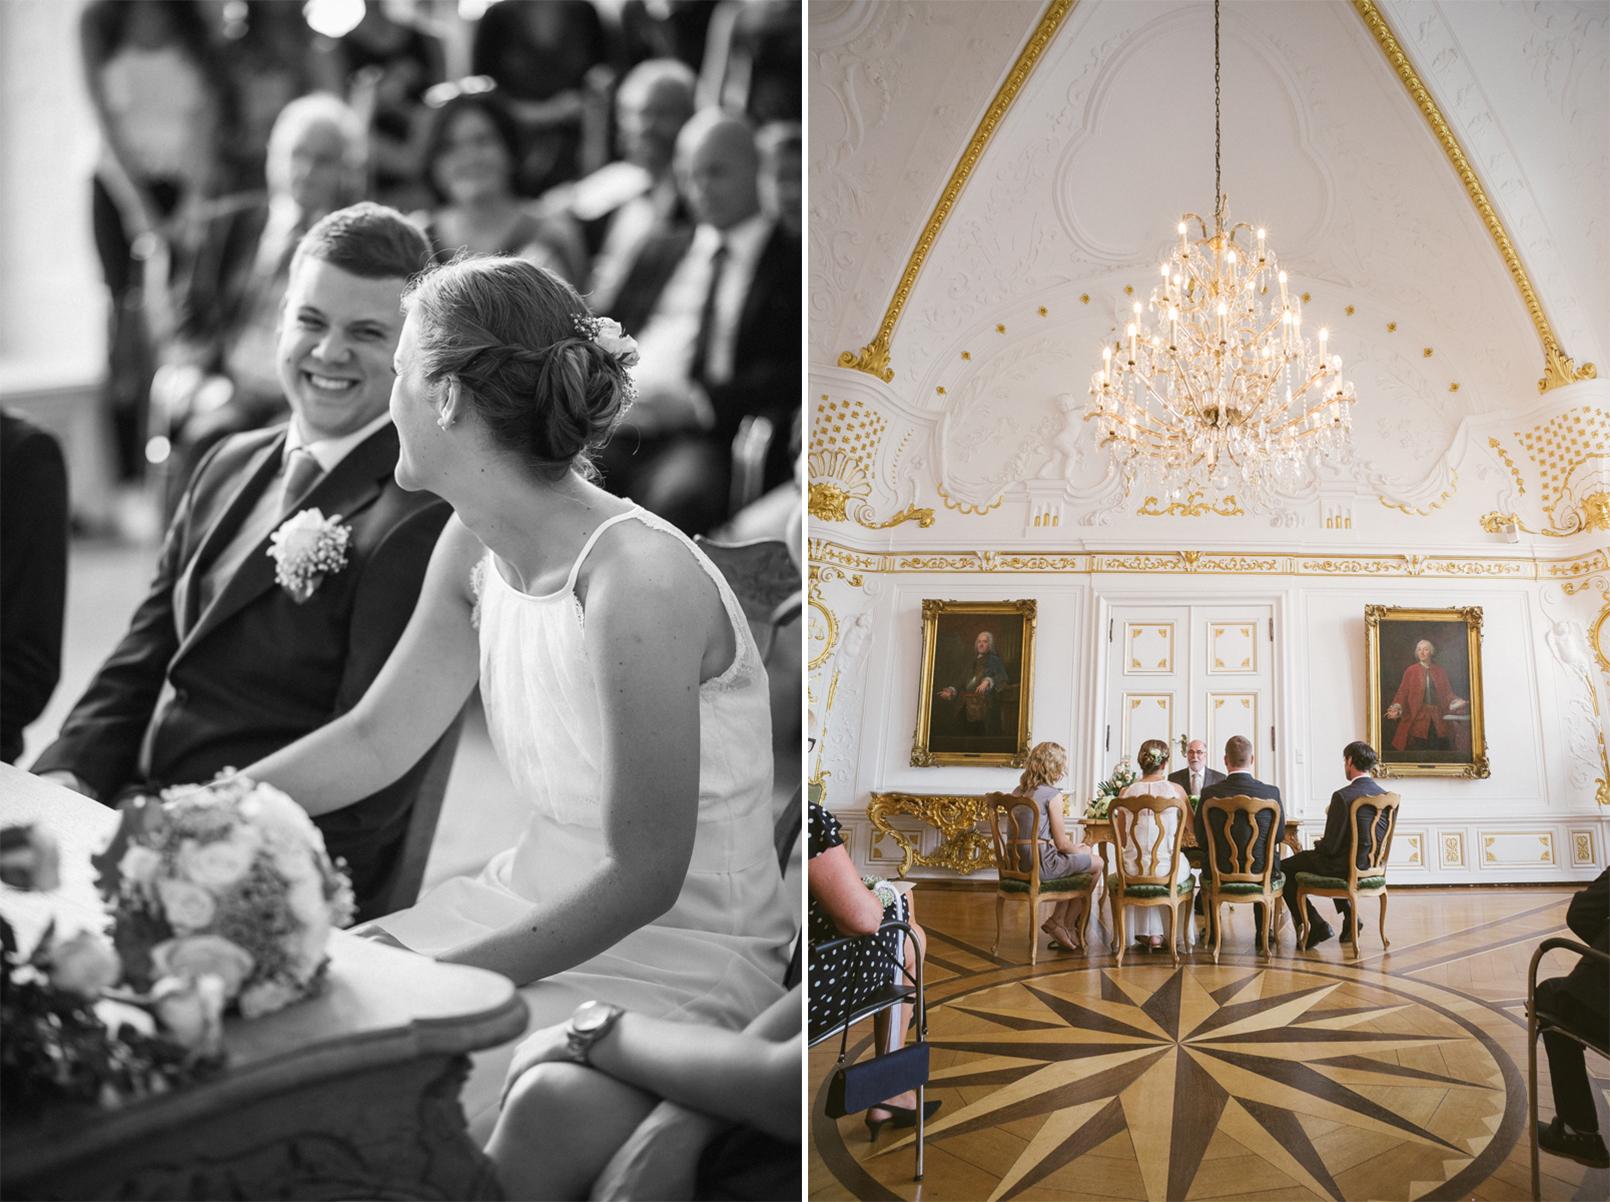 Hochzeitsfotograf-Fotografie-Aachen-Lua-Pauline-Dreamcatcher-0017